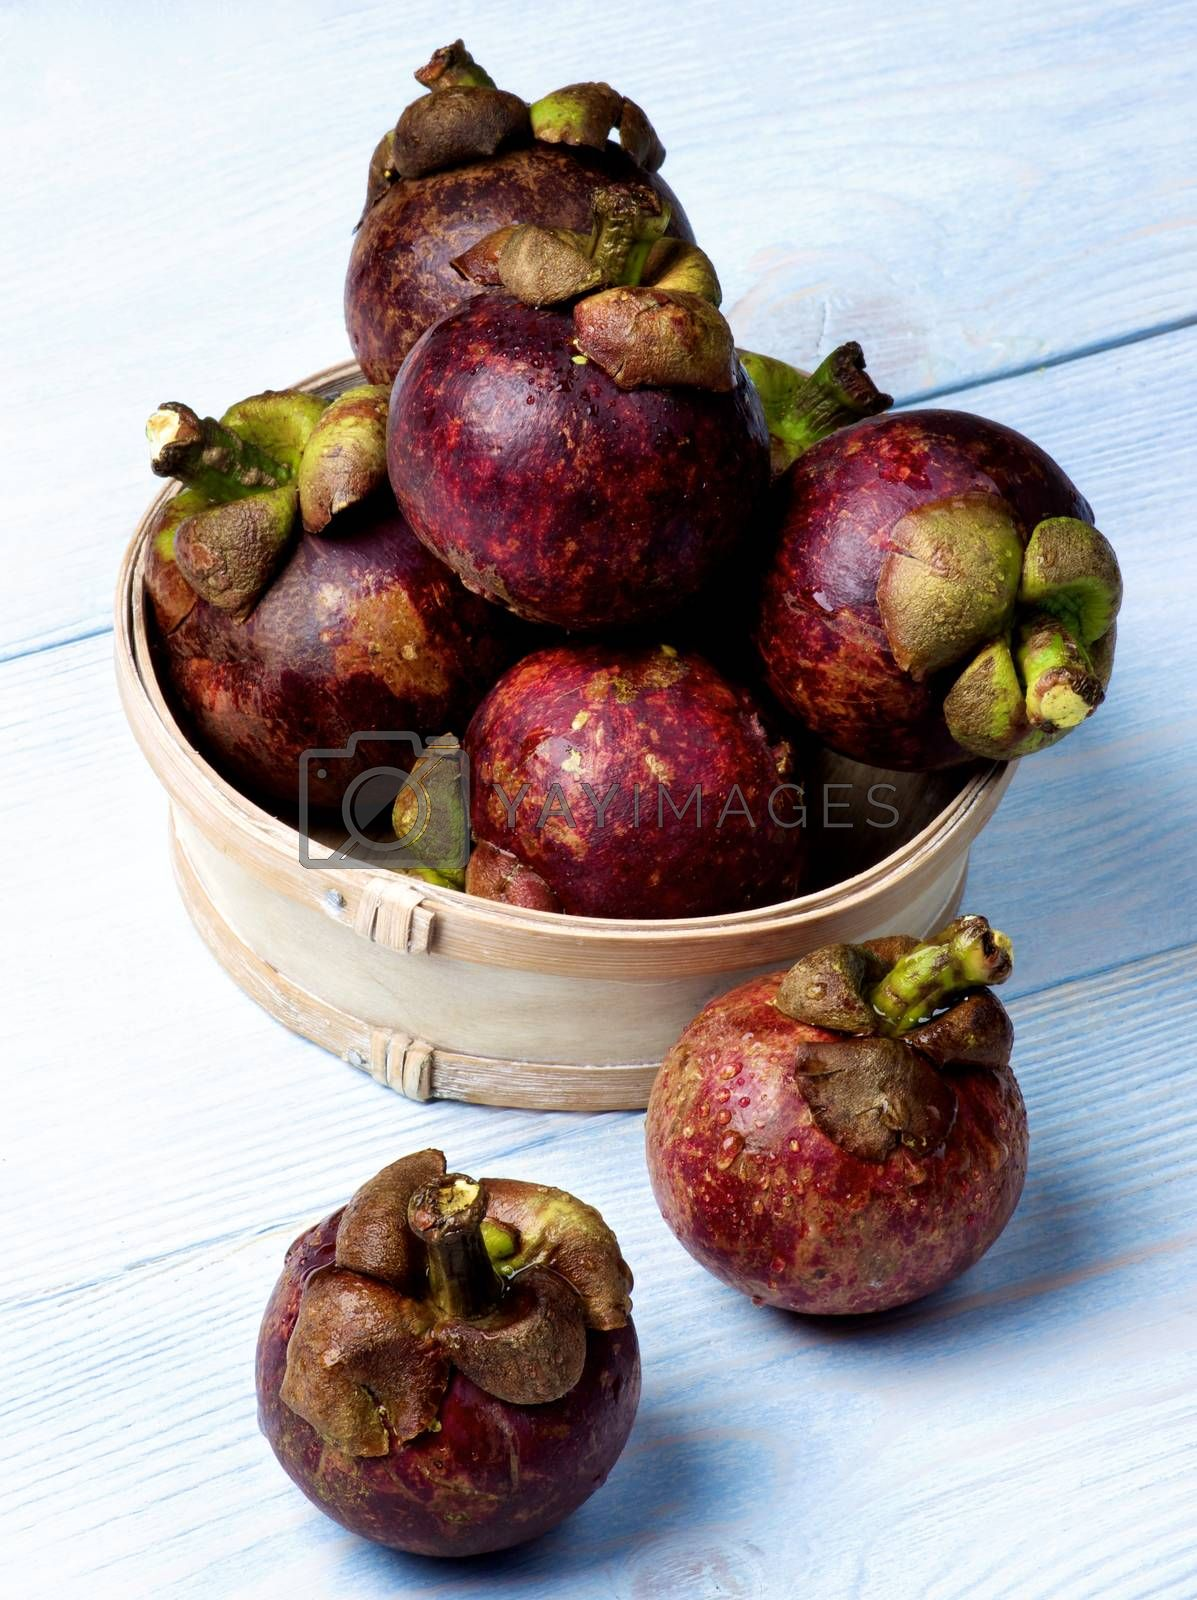 Heap of Fresh Ripe Mangosteen in Wooden Bowl closeup on Light Blue Wooden background